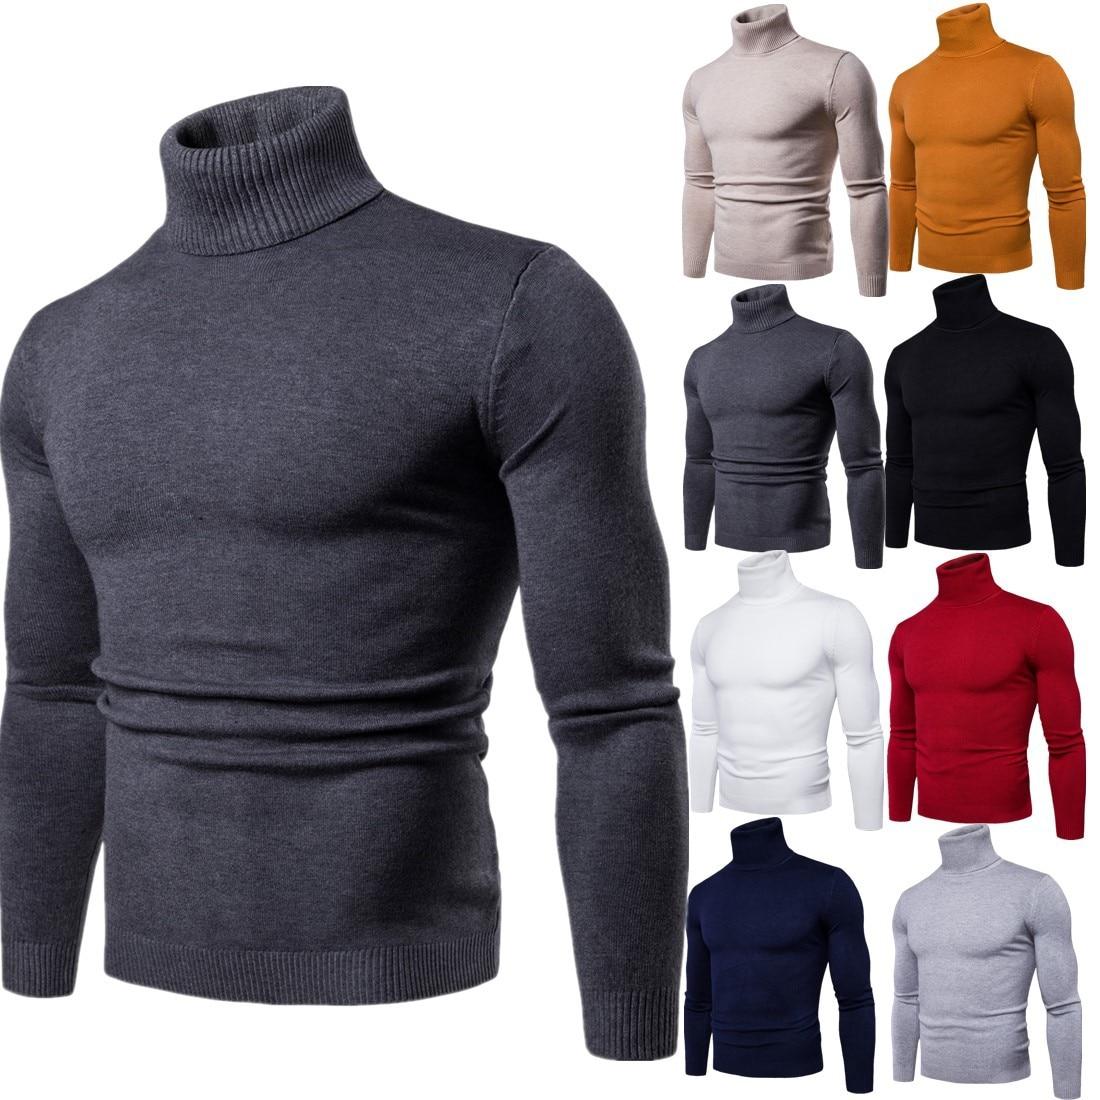 FAVOCENT Inverno Quente Camisola de Gola Alta Homens Moda Sólidos Malha Suéteres Mens 2018 Ocasional Masculina Gola Dupla Slim Fit Pullover